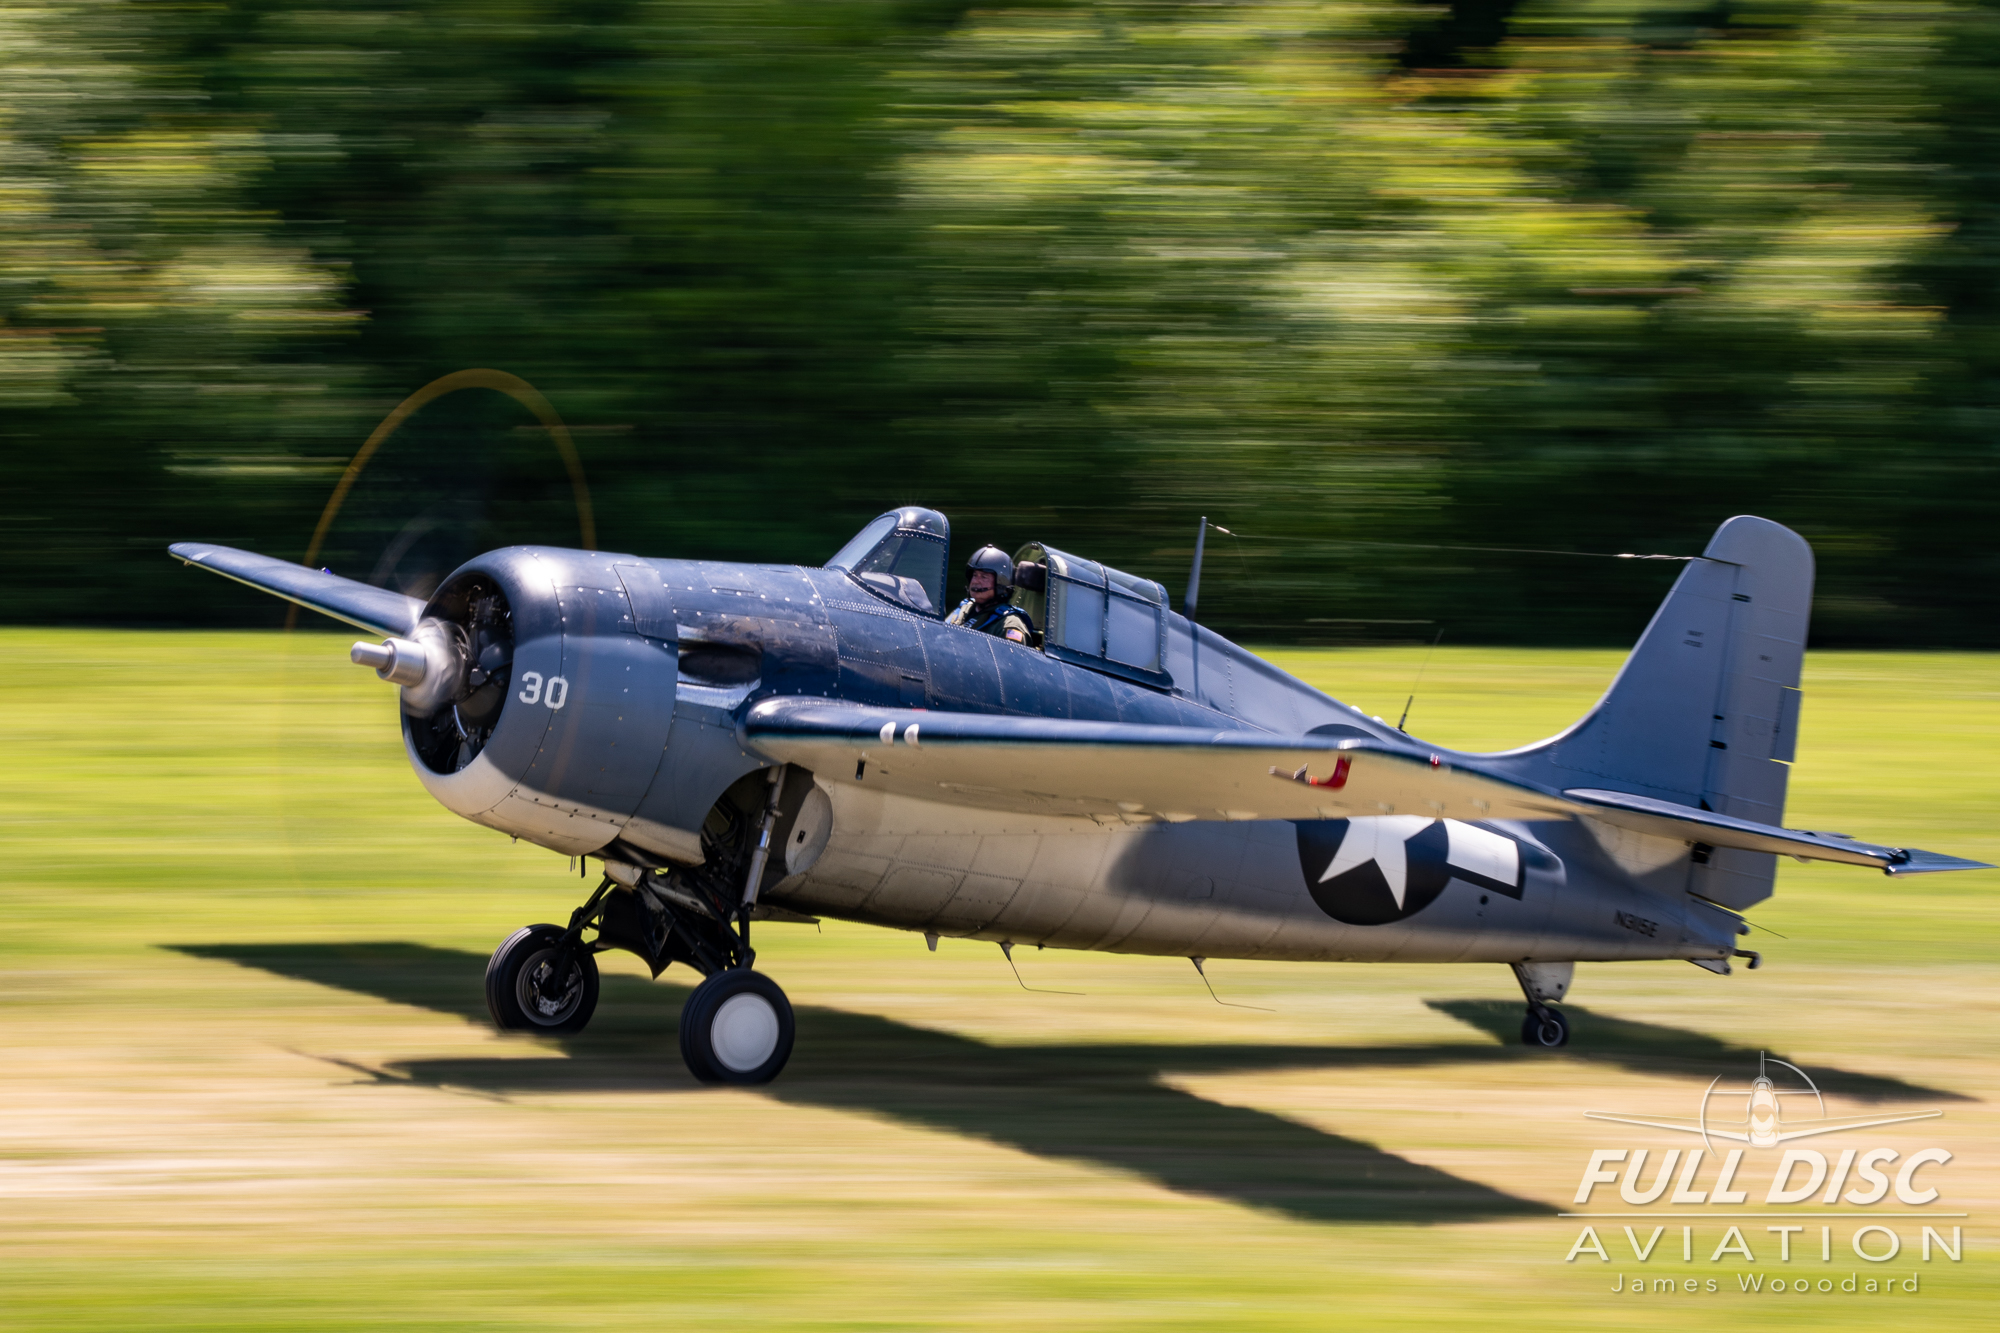 WarbirdsOverTheBeach_FullDiscAviation_JamesWoodard-May 18, 2019-91.jpg